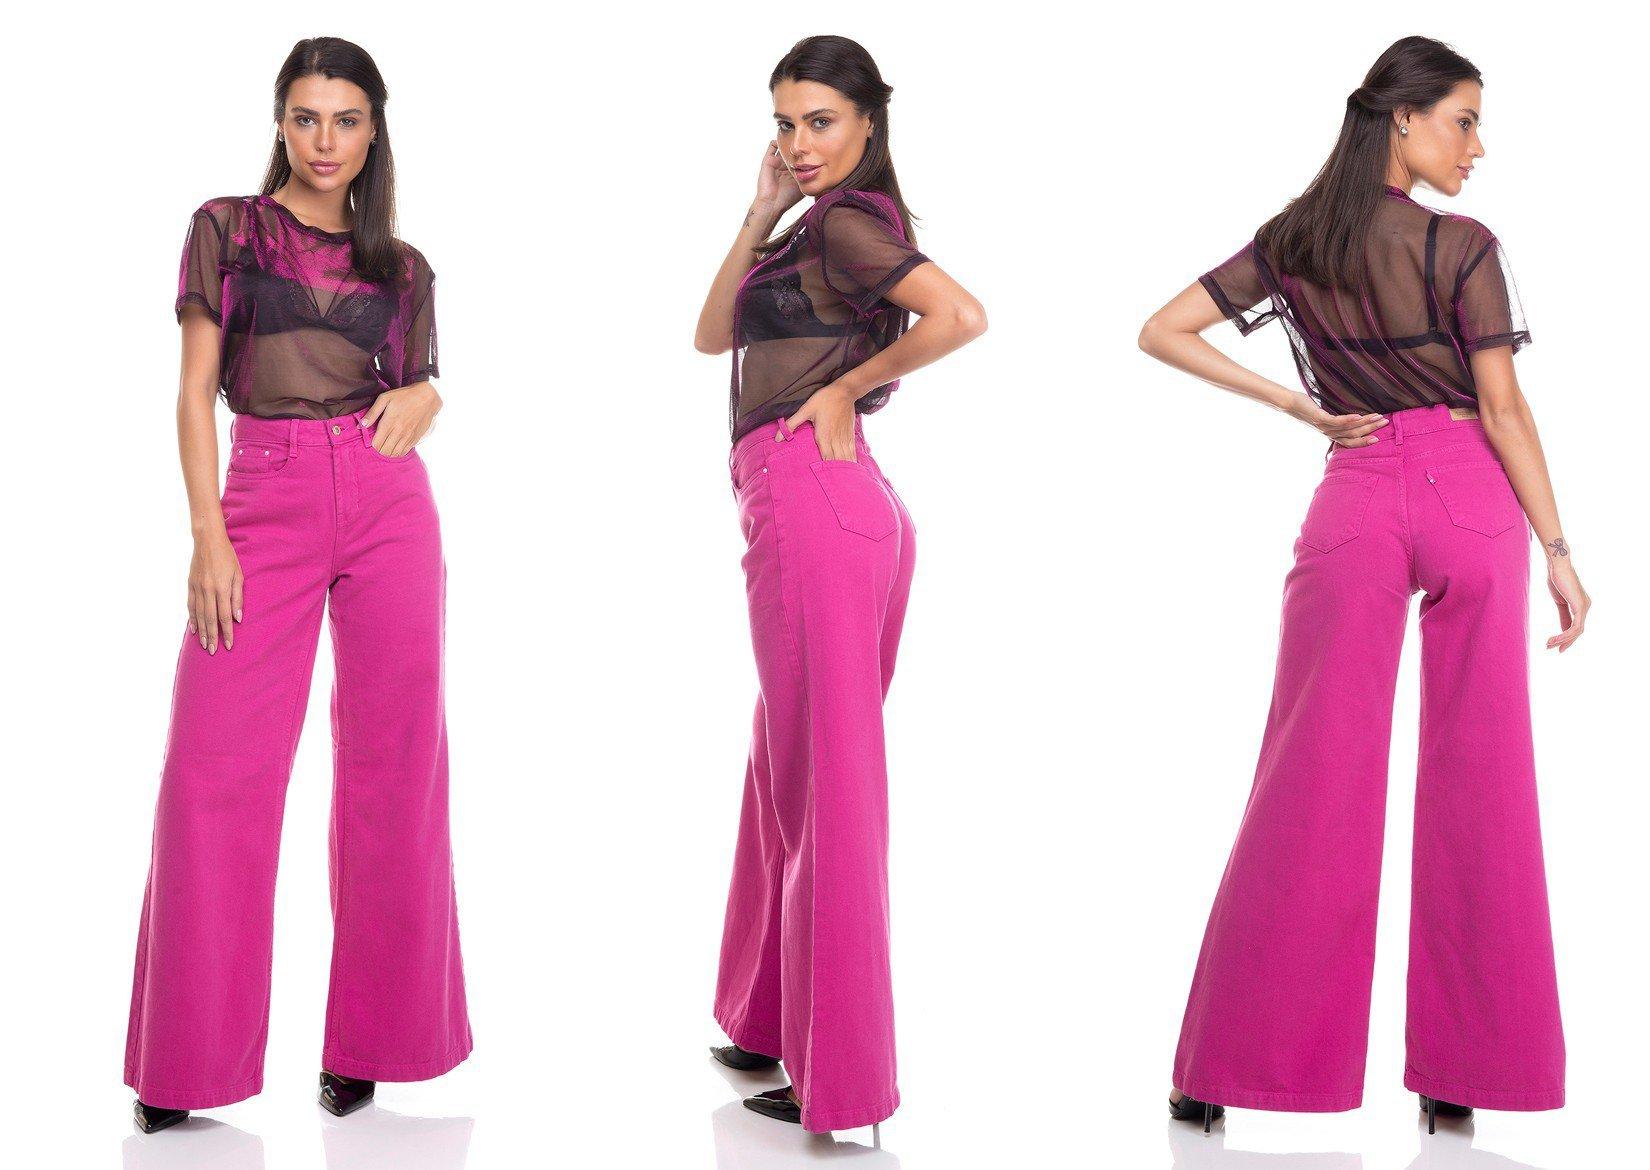 dz3383 calca jeans feminina pantalona colorida denim zero tripla